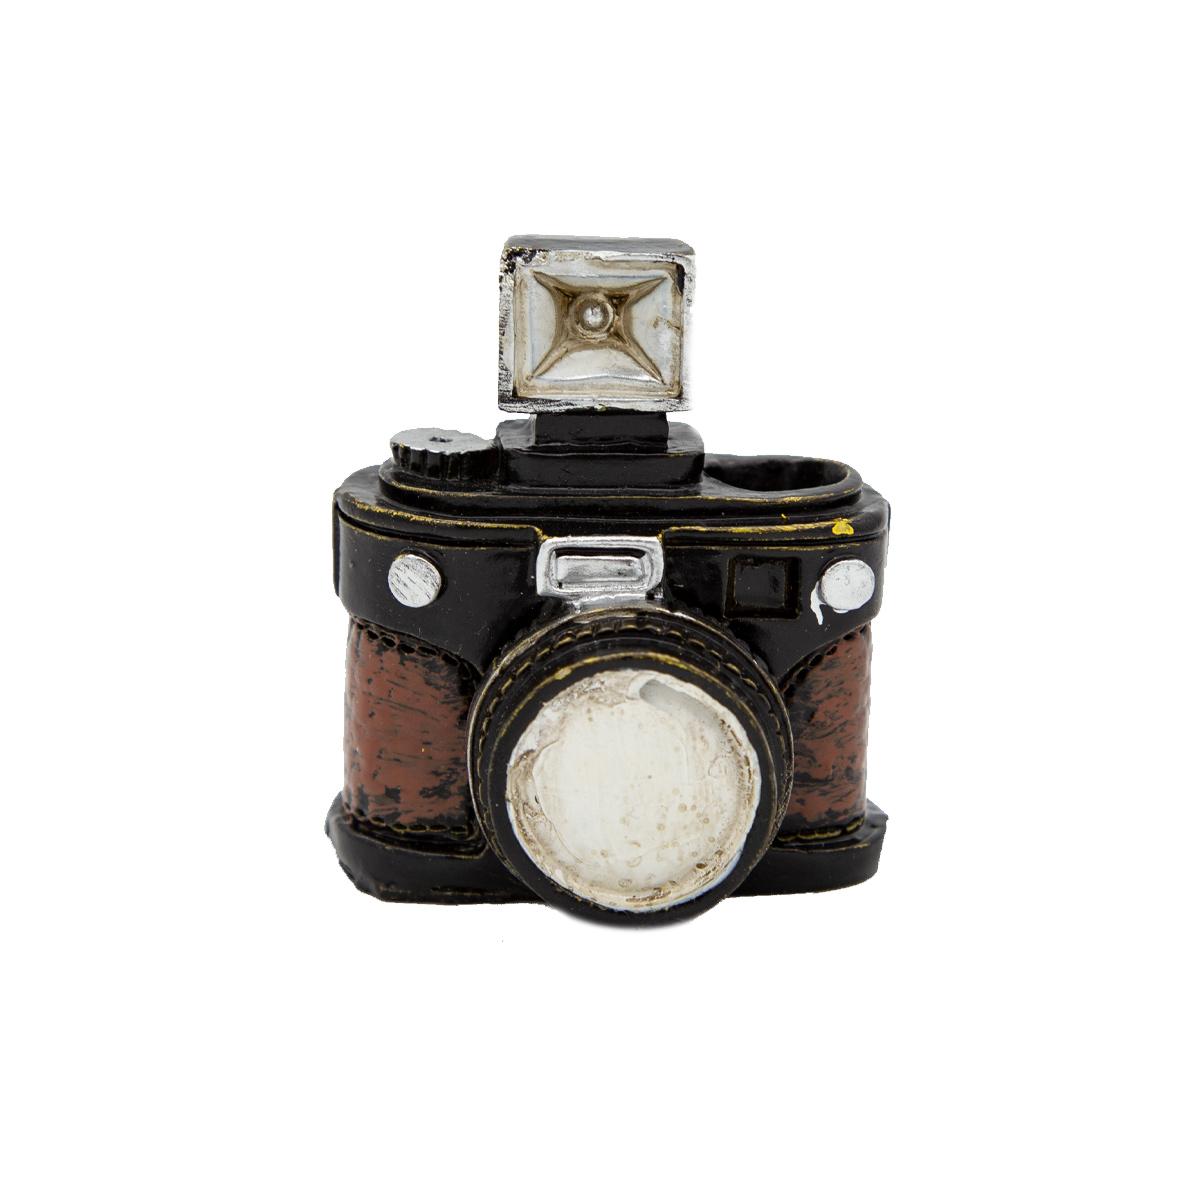 SL015B028 Фотоаппарат 5*4 см